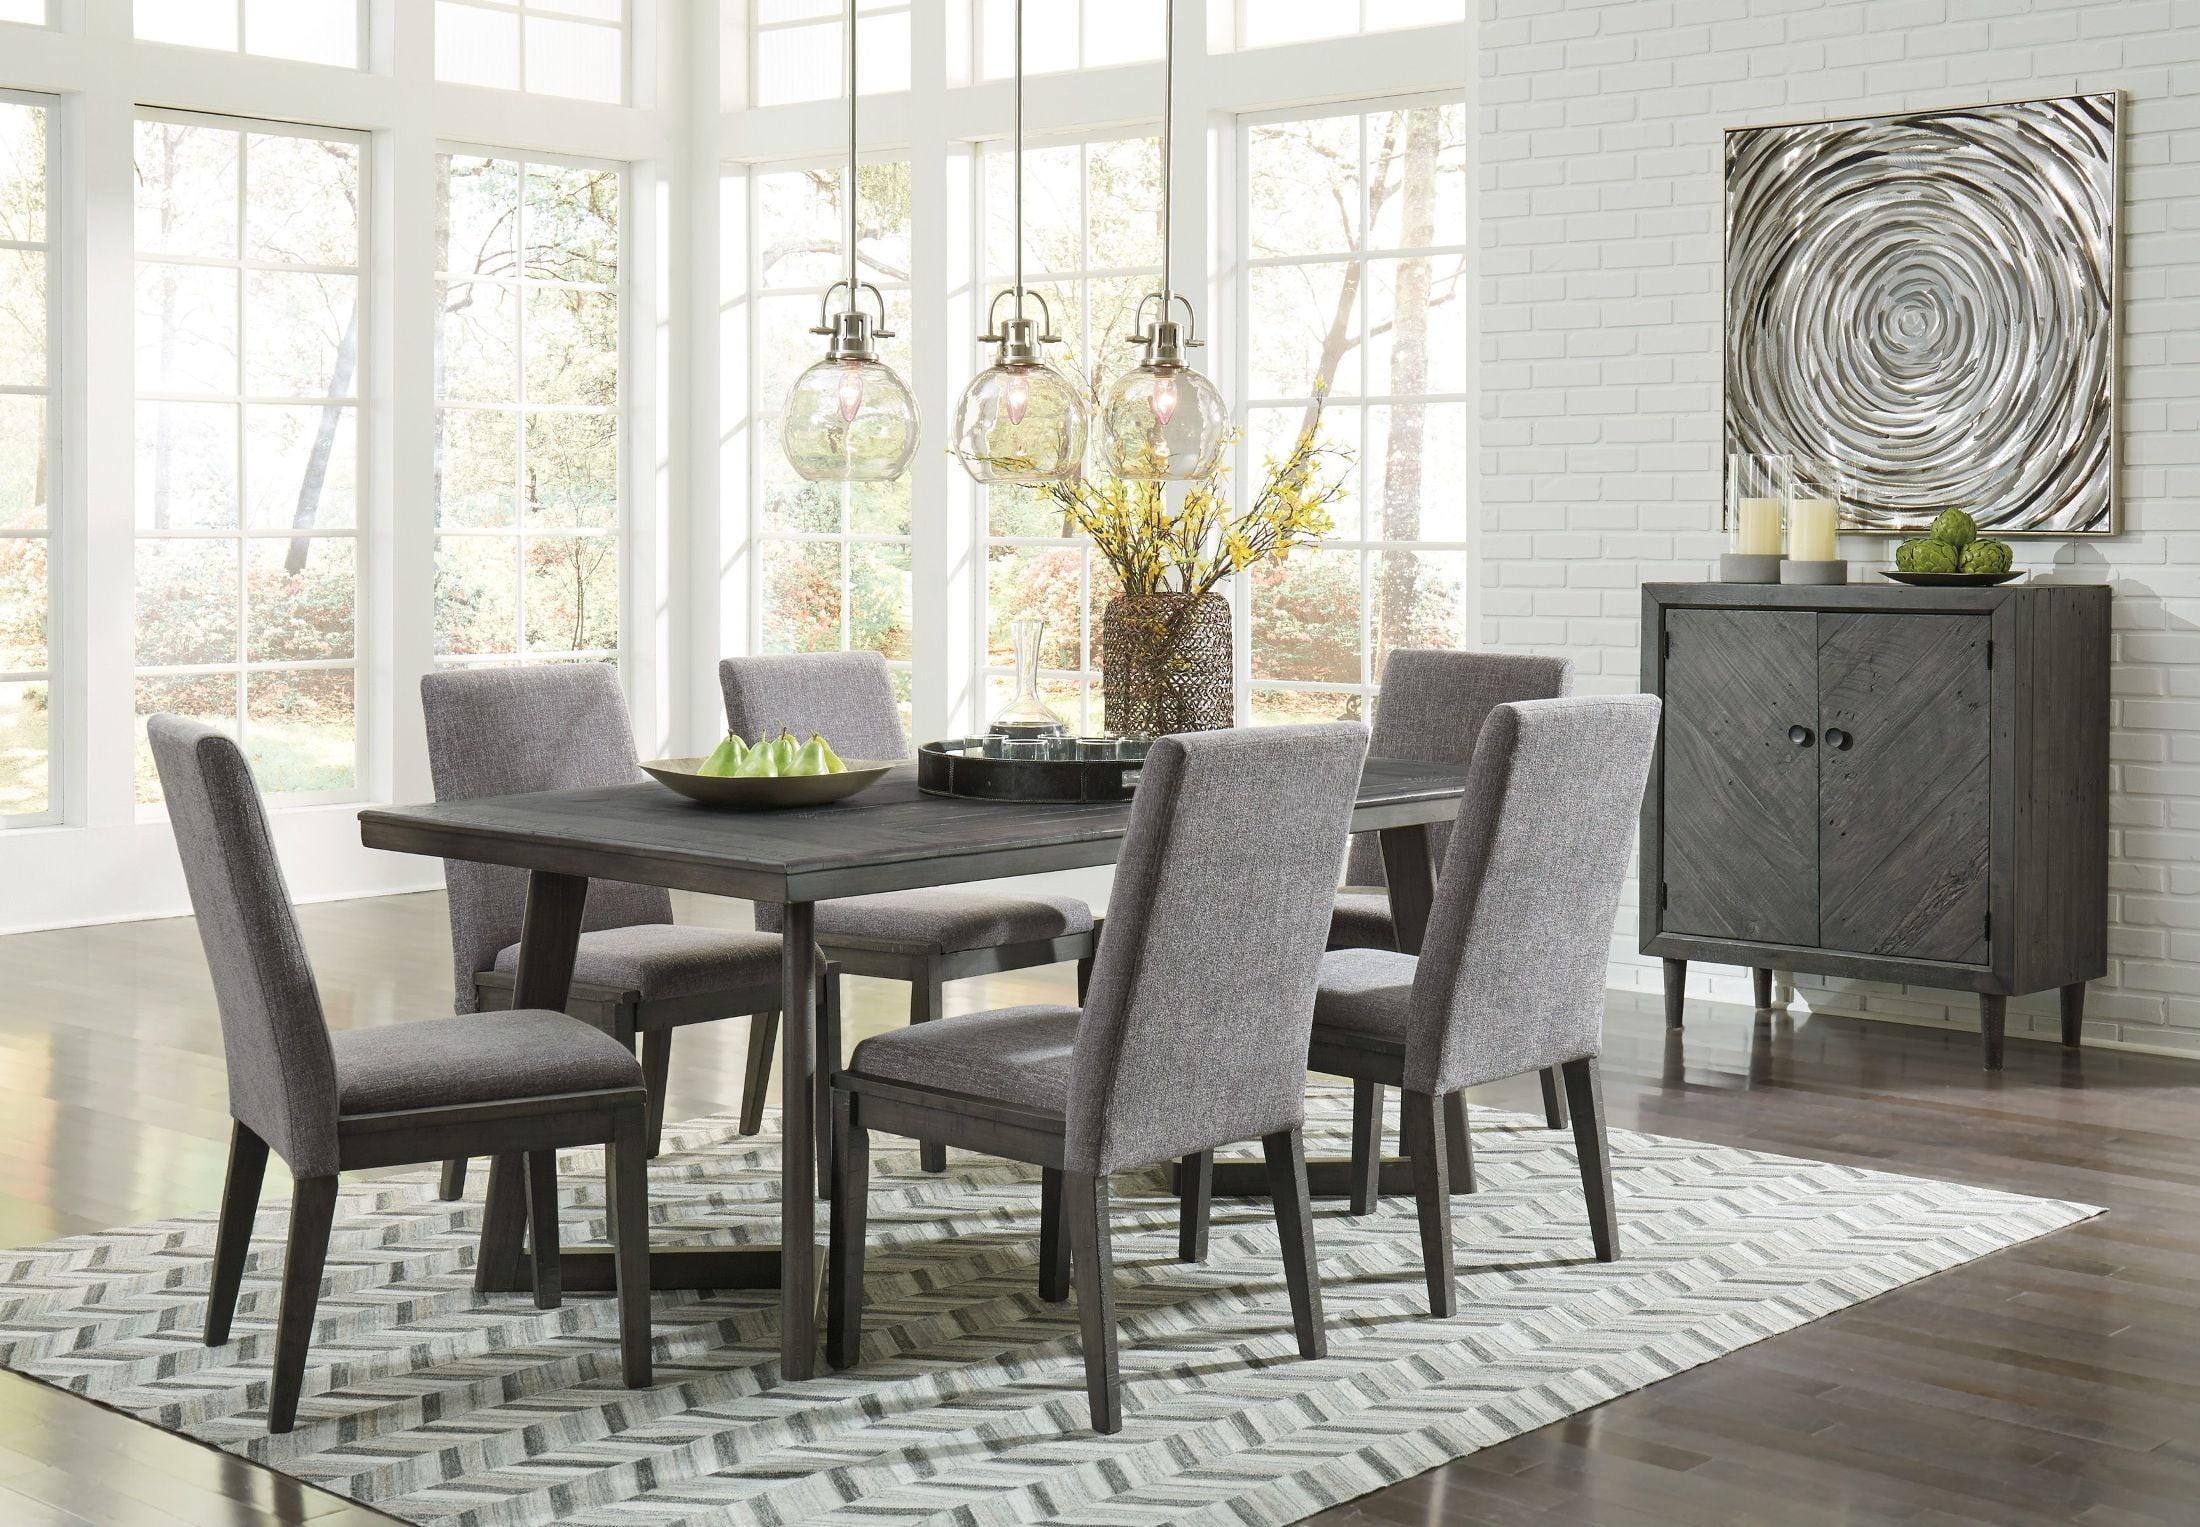 dining room set up ideas | Besteneer Gray Rectangular Dining Room Set - 1StopBedrooms.